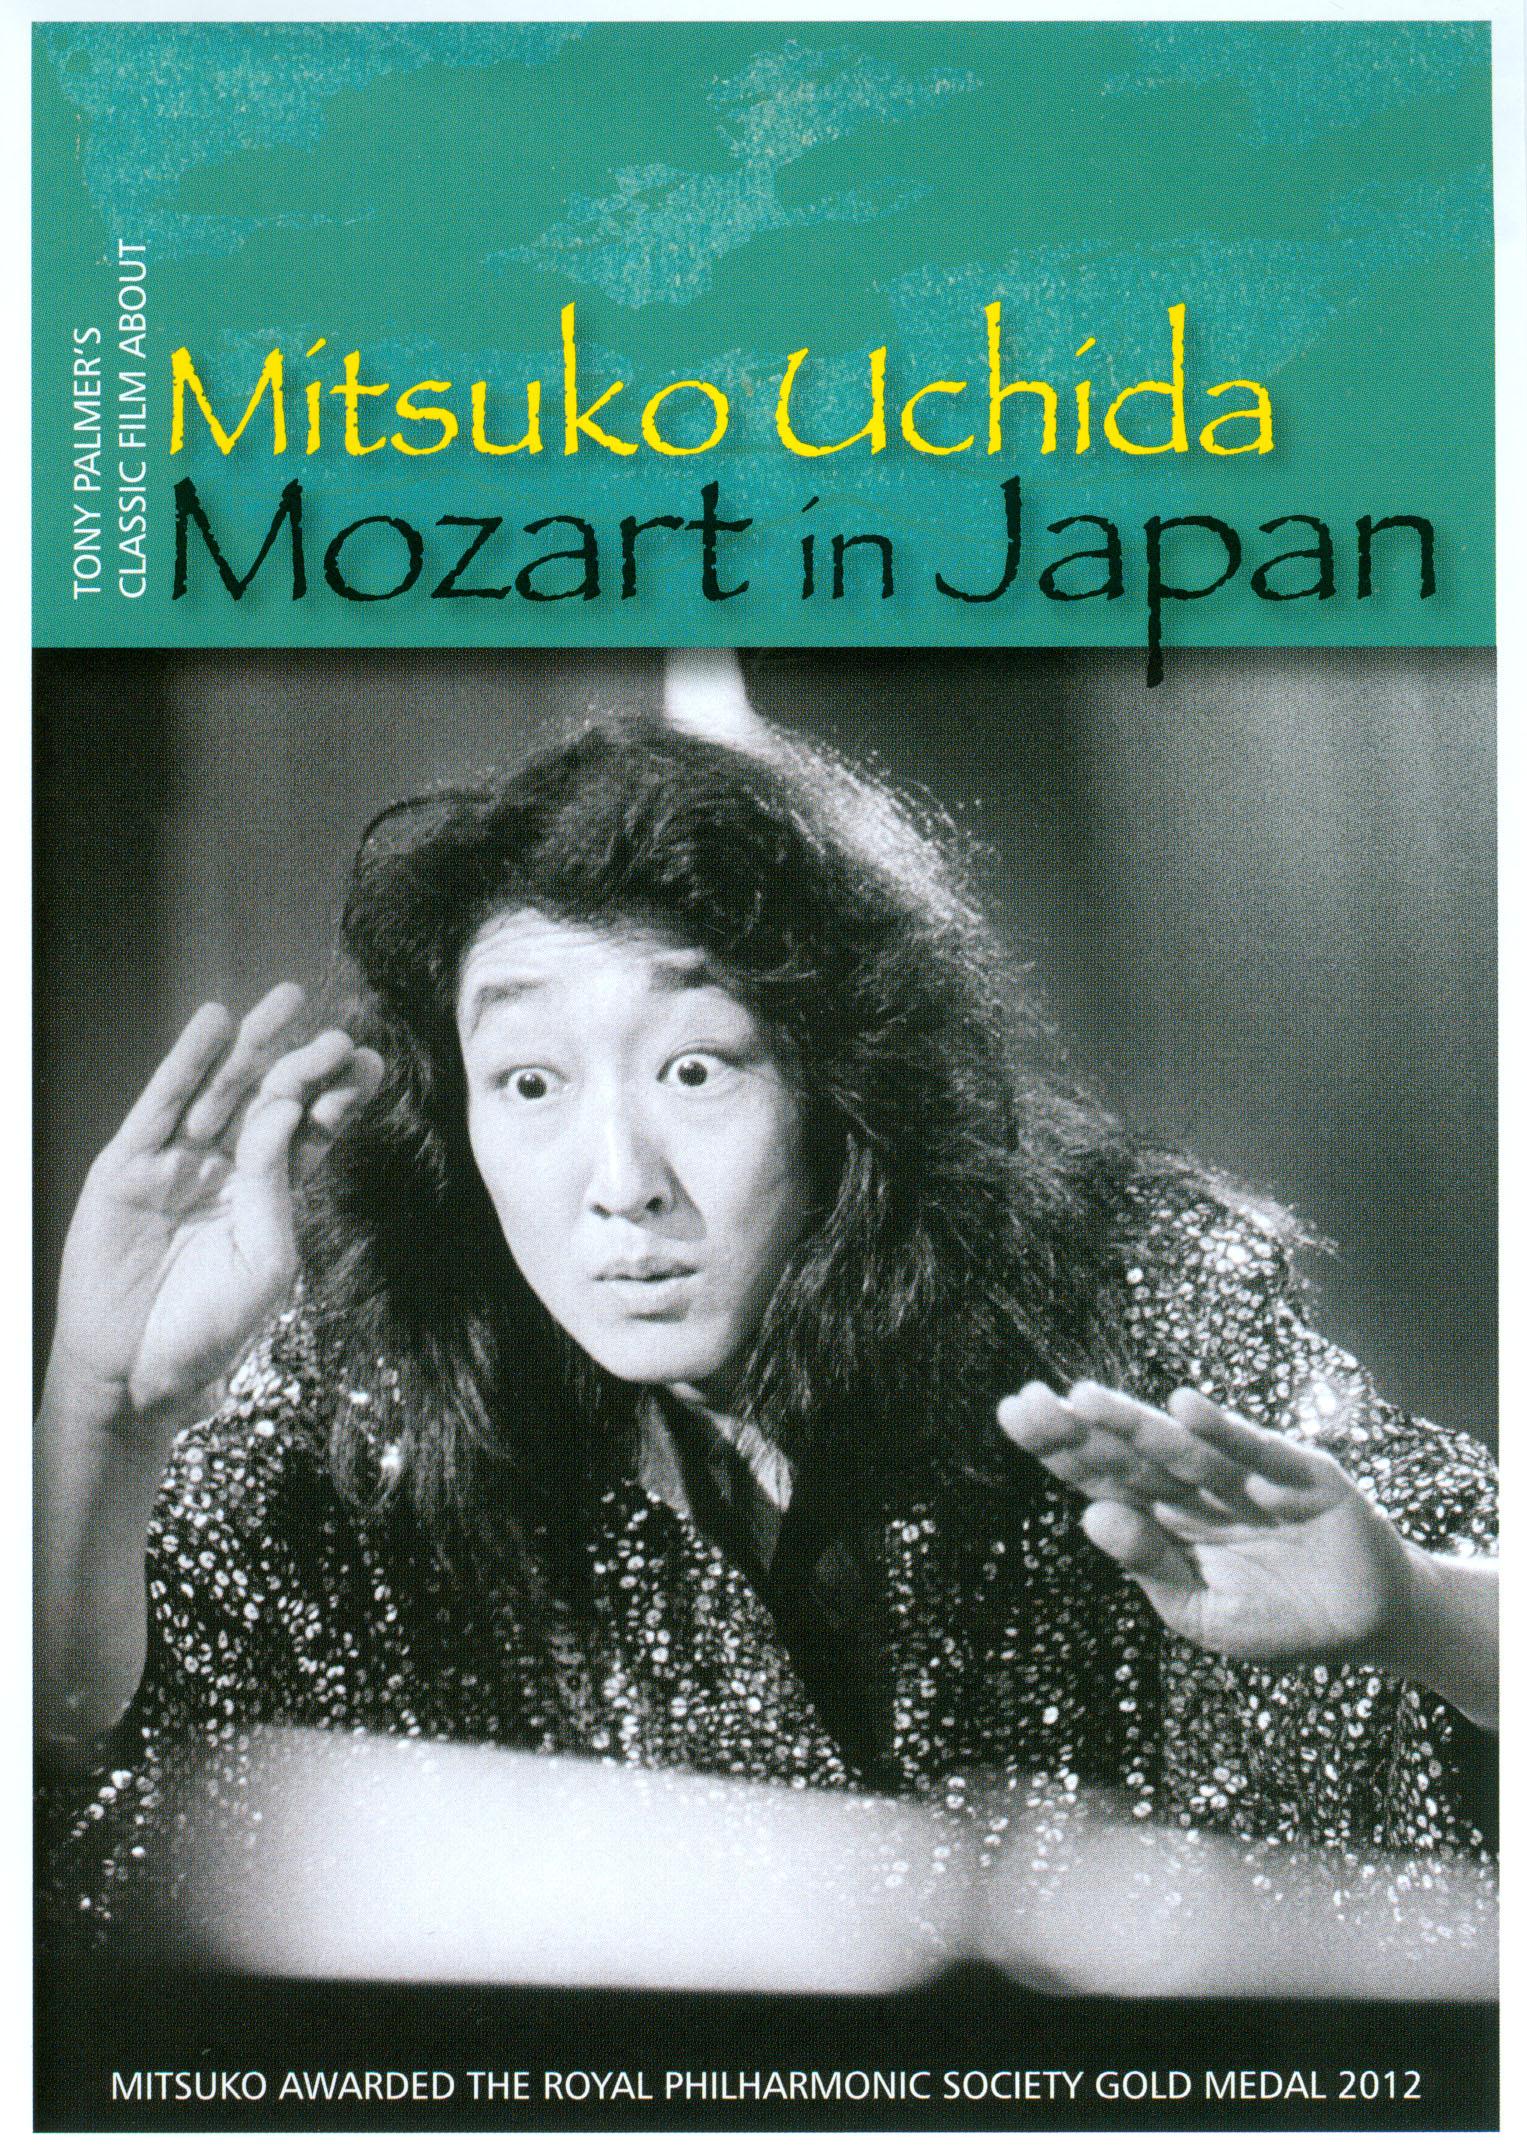 Mitsuko Uchida: Mozart in Japan